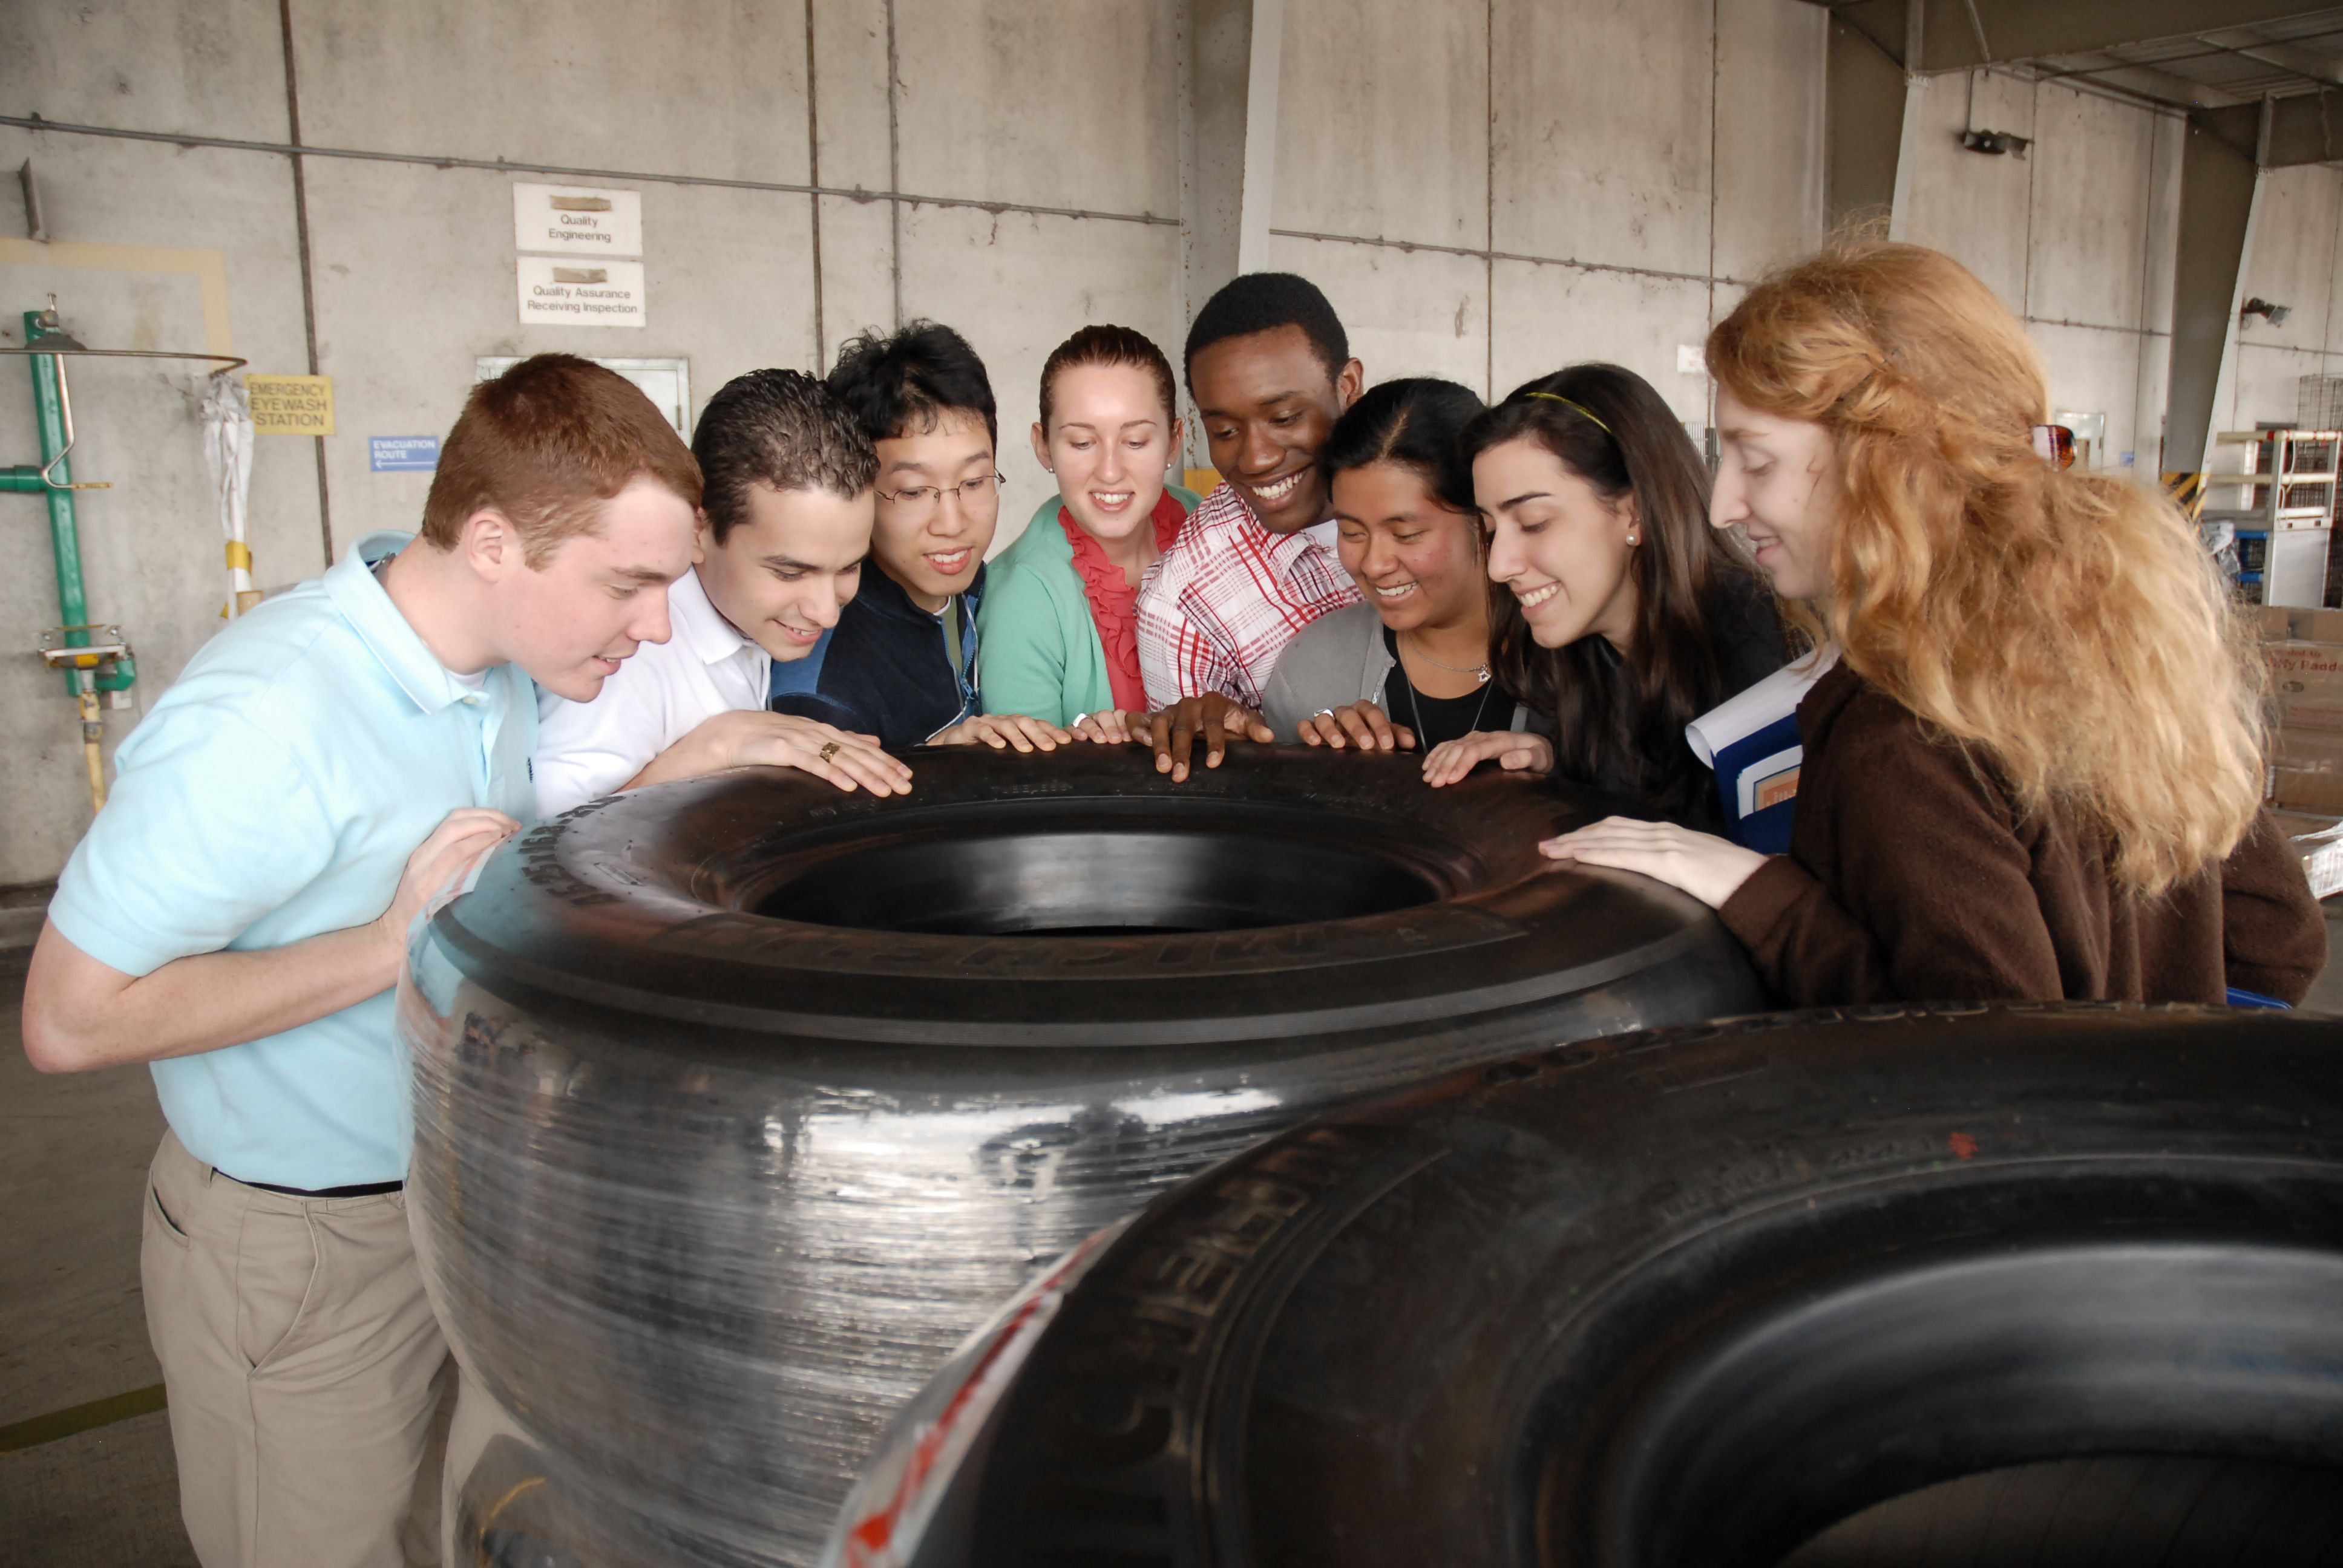 Eight Aerospace Engineering Students From The Massachusetts Institute Of Technolo Harvard Business School Massachusetts Institute Of Technology Business School